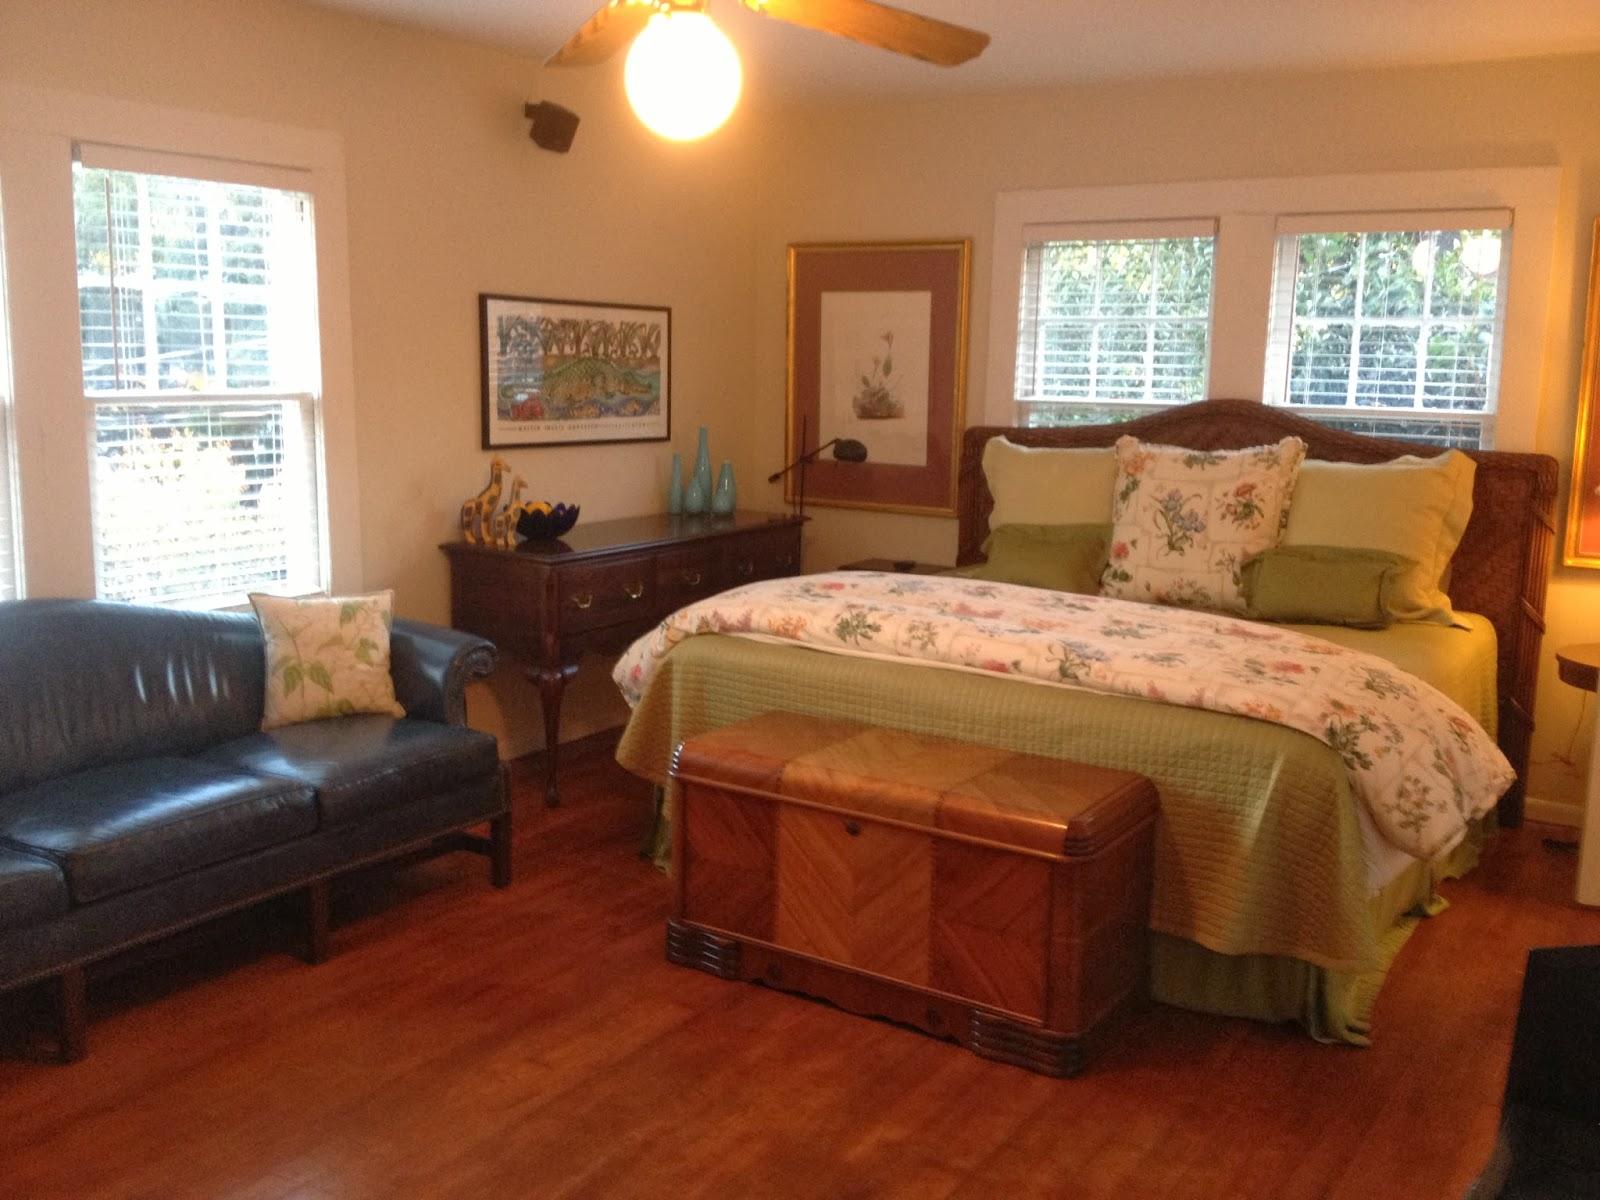 114 fels ave fairhope upstairs apartment full kitchen - Living room bedroom bathroom kitchen ...